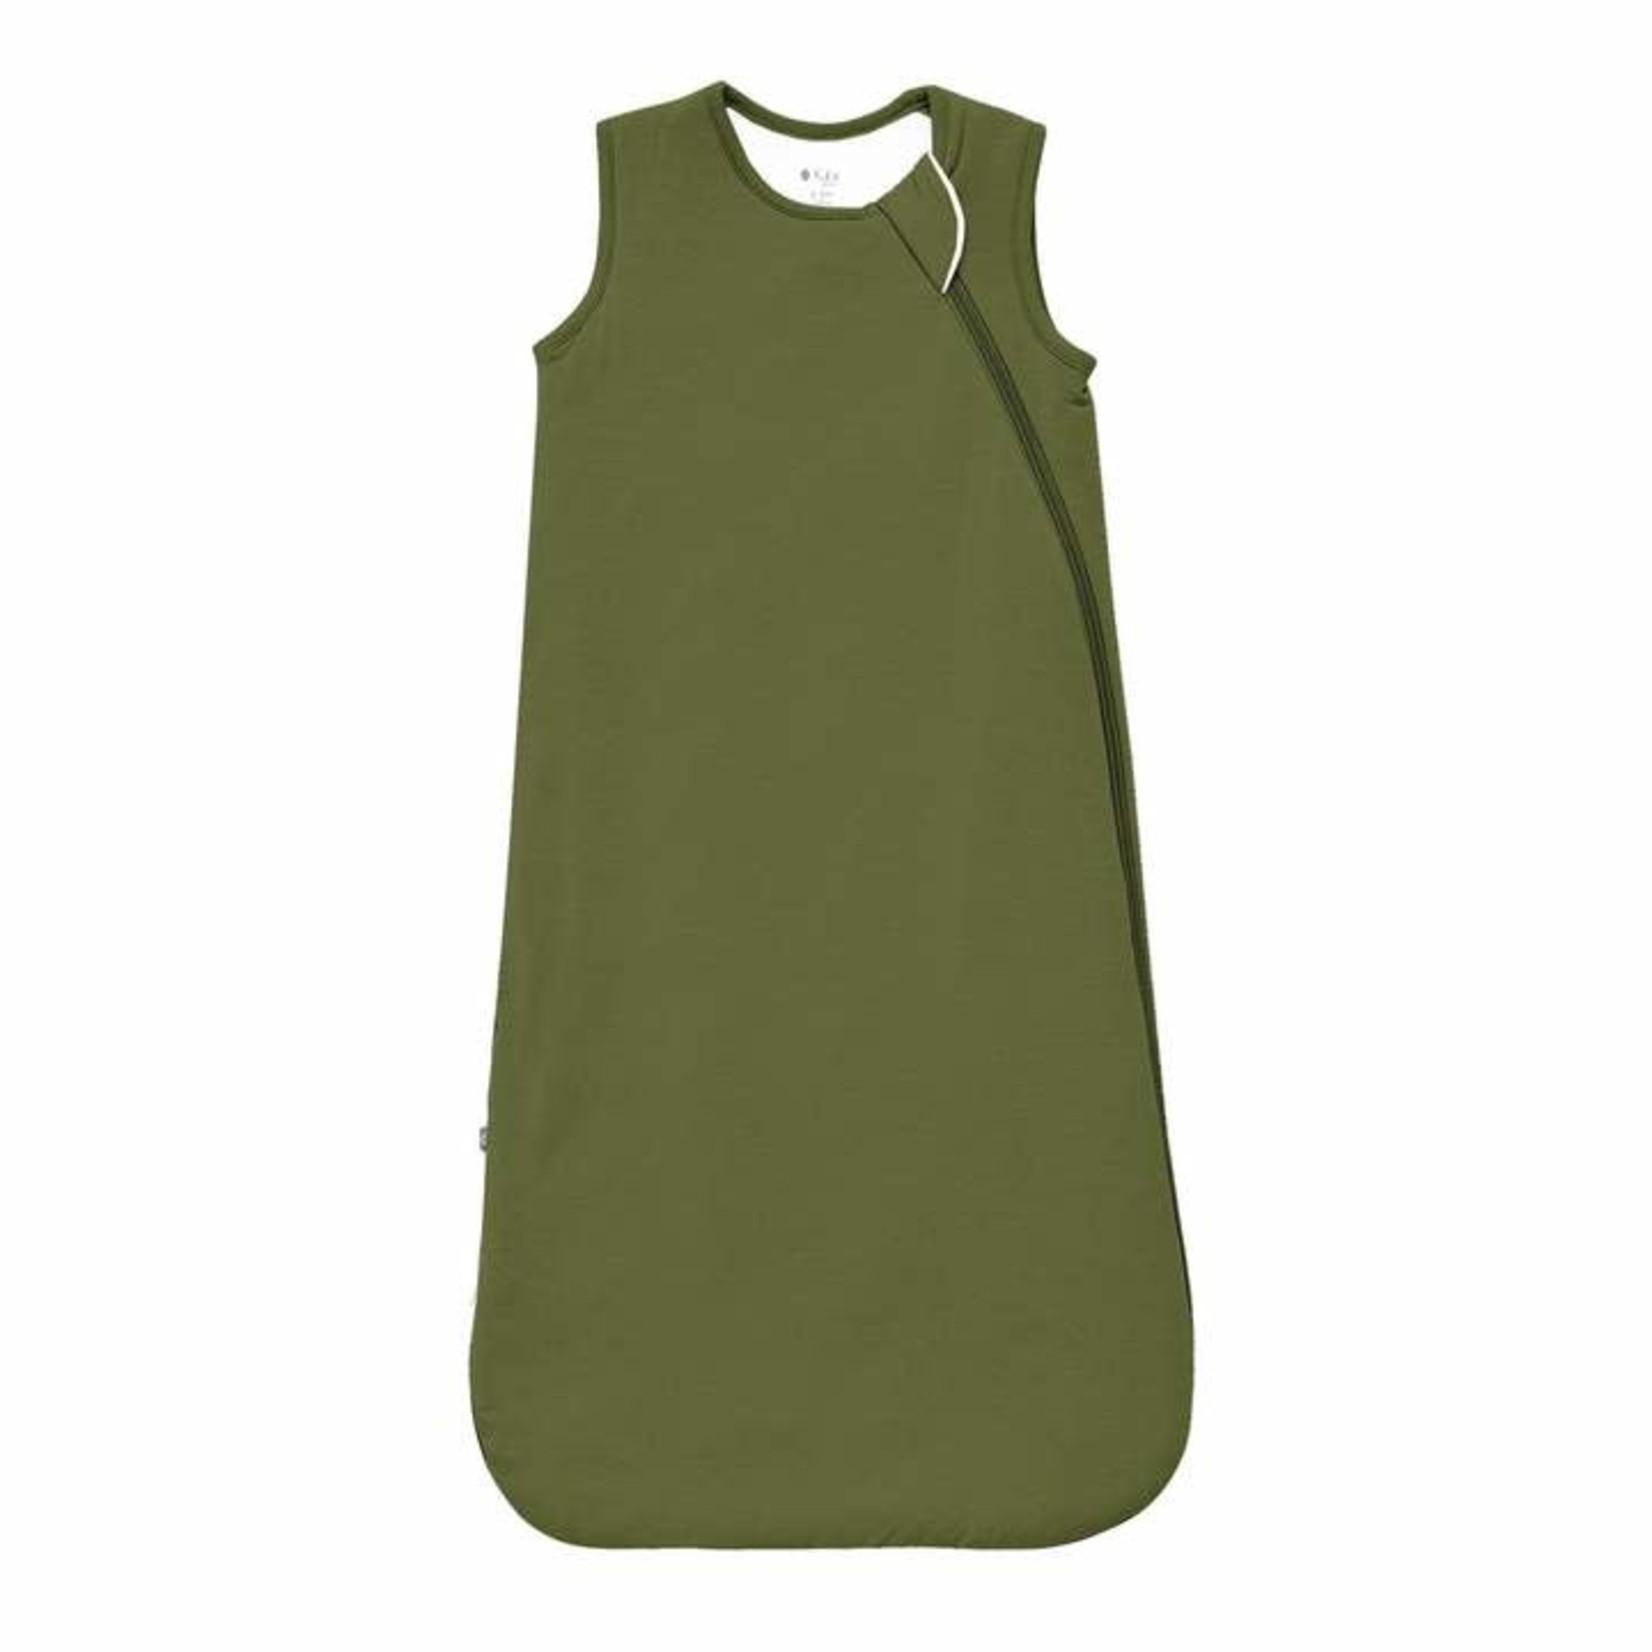 Kyte Baby Bamboo Sleep Bag 1.0 Olive